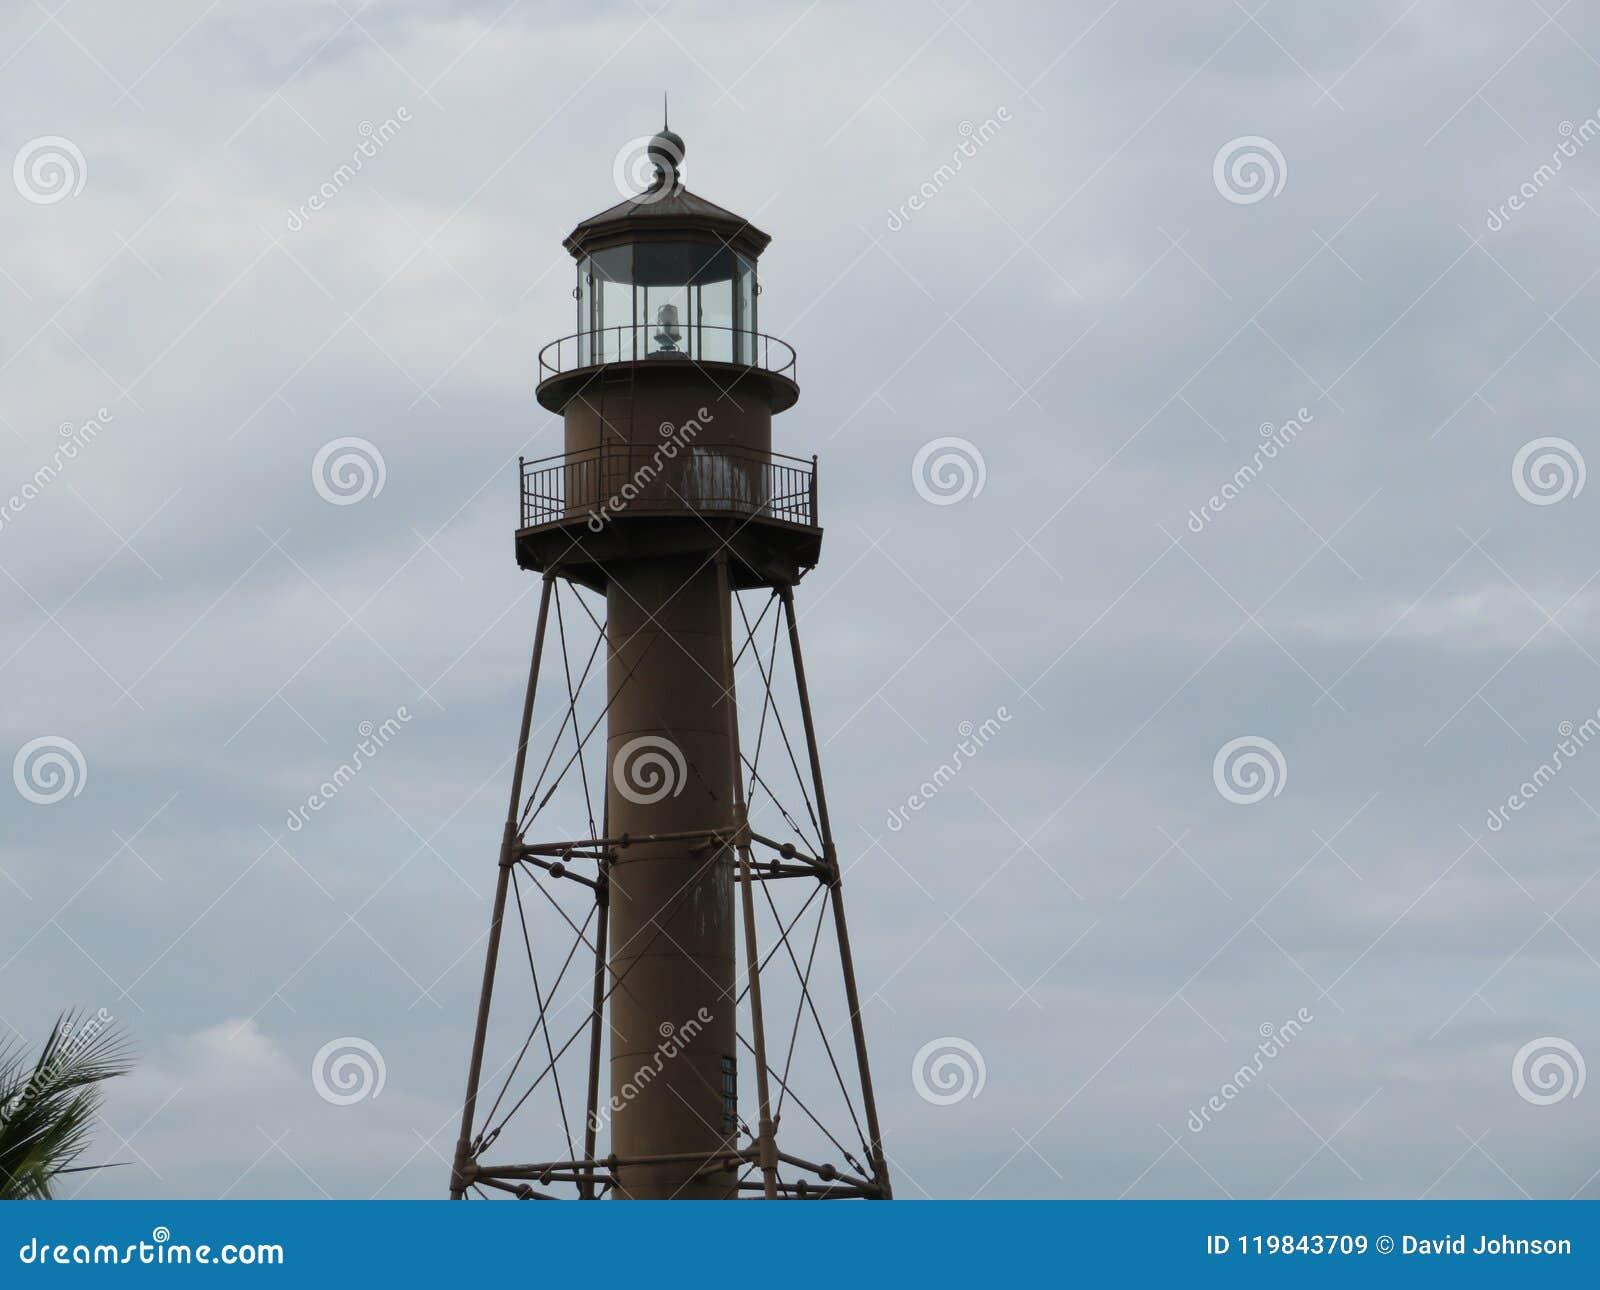 Lighthouse close-up on Sanibel island Florida